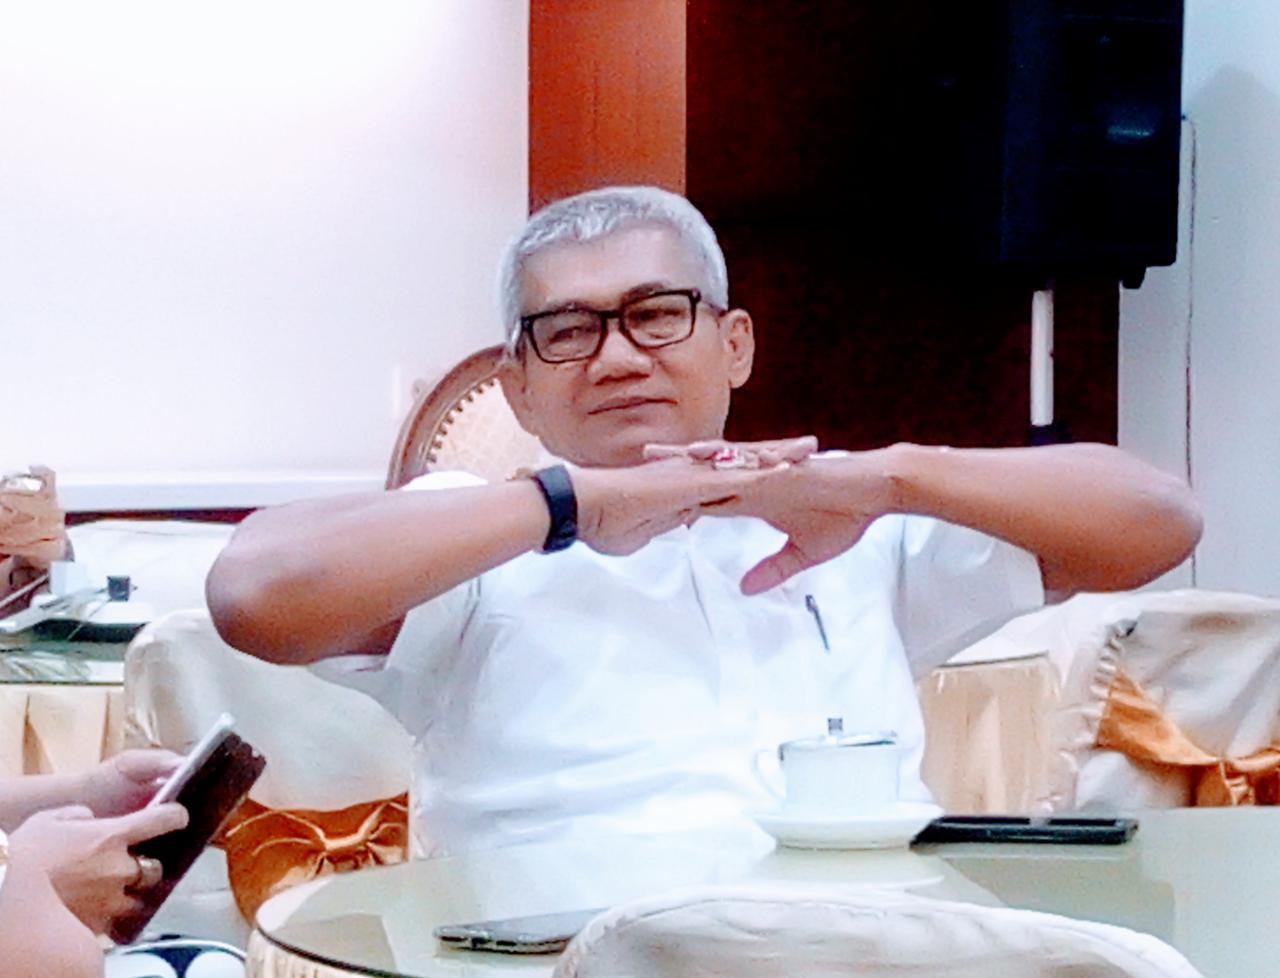 Agun Gunandjar: Partai Golkar Miliki Strategi Khusus Memenangkan Pileg 2019